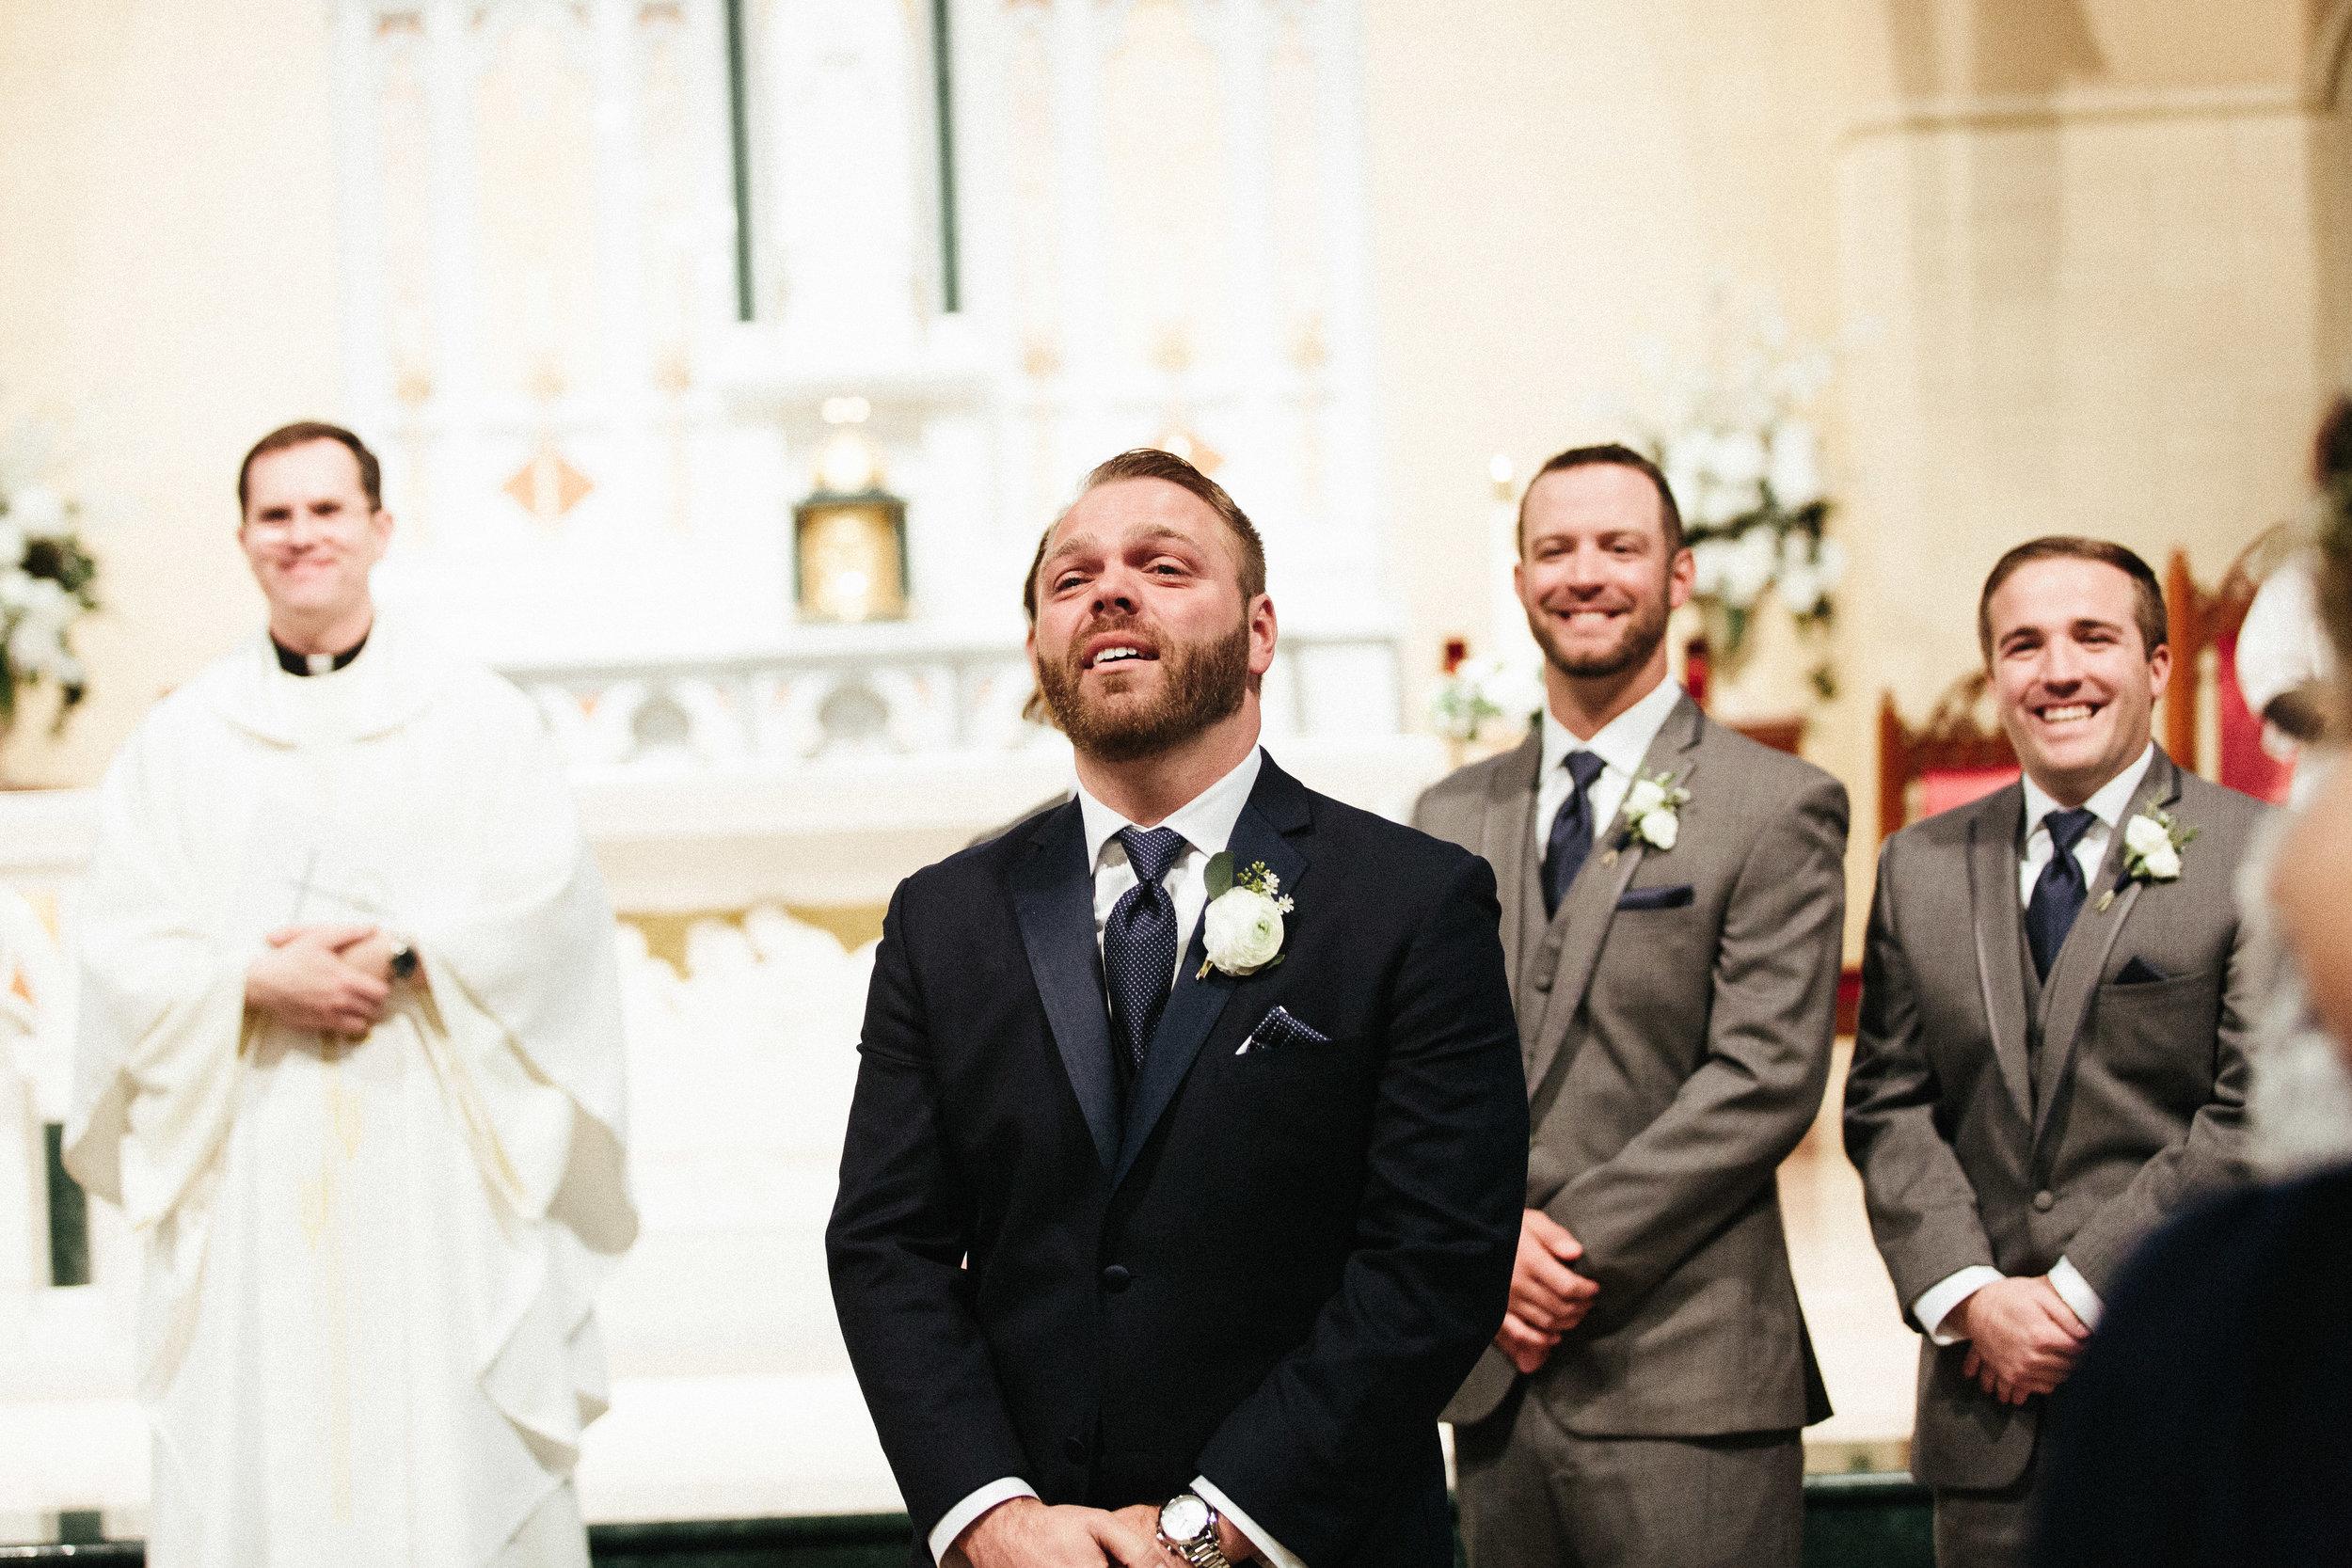 roswell_st_peter_chanel_catholic_avalon_hotel_alpharetta_wedding-1445.jpg